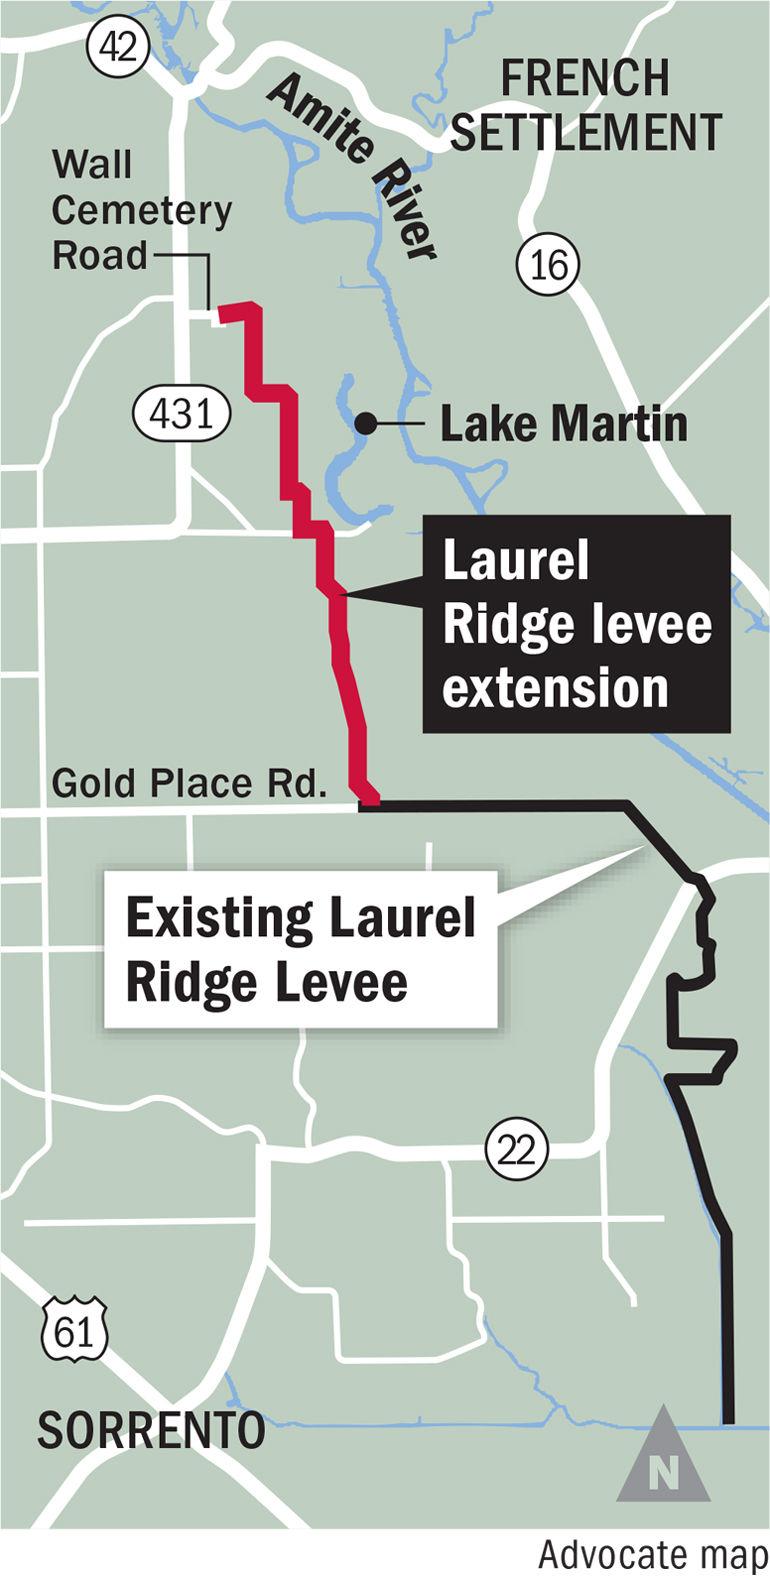 020618 Laurel Ridge Levee.jpg